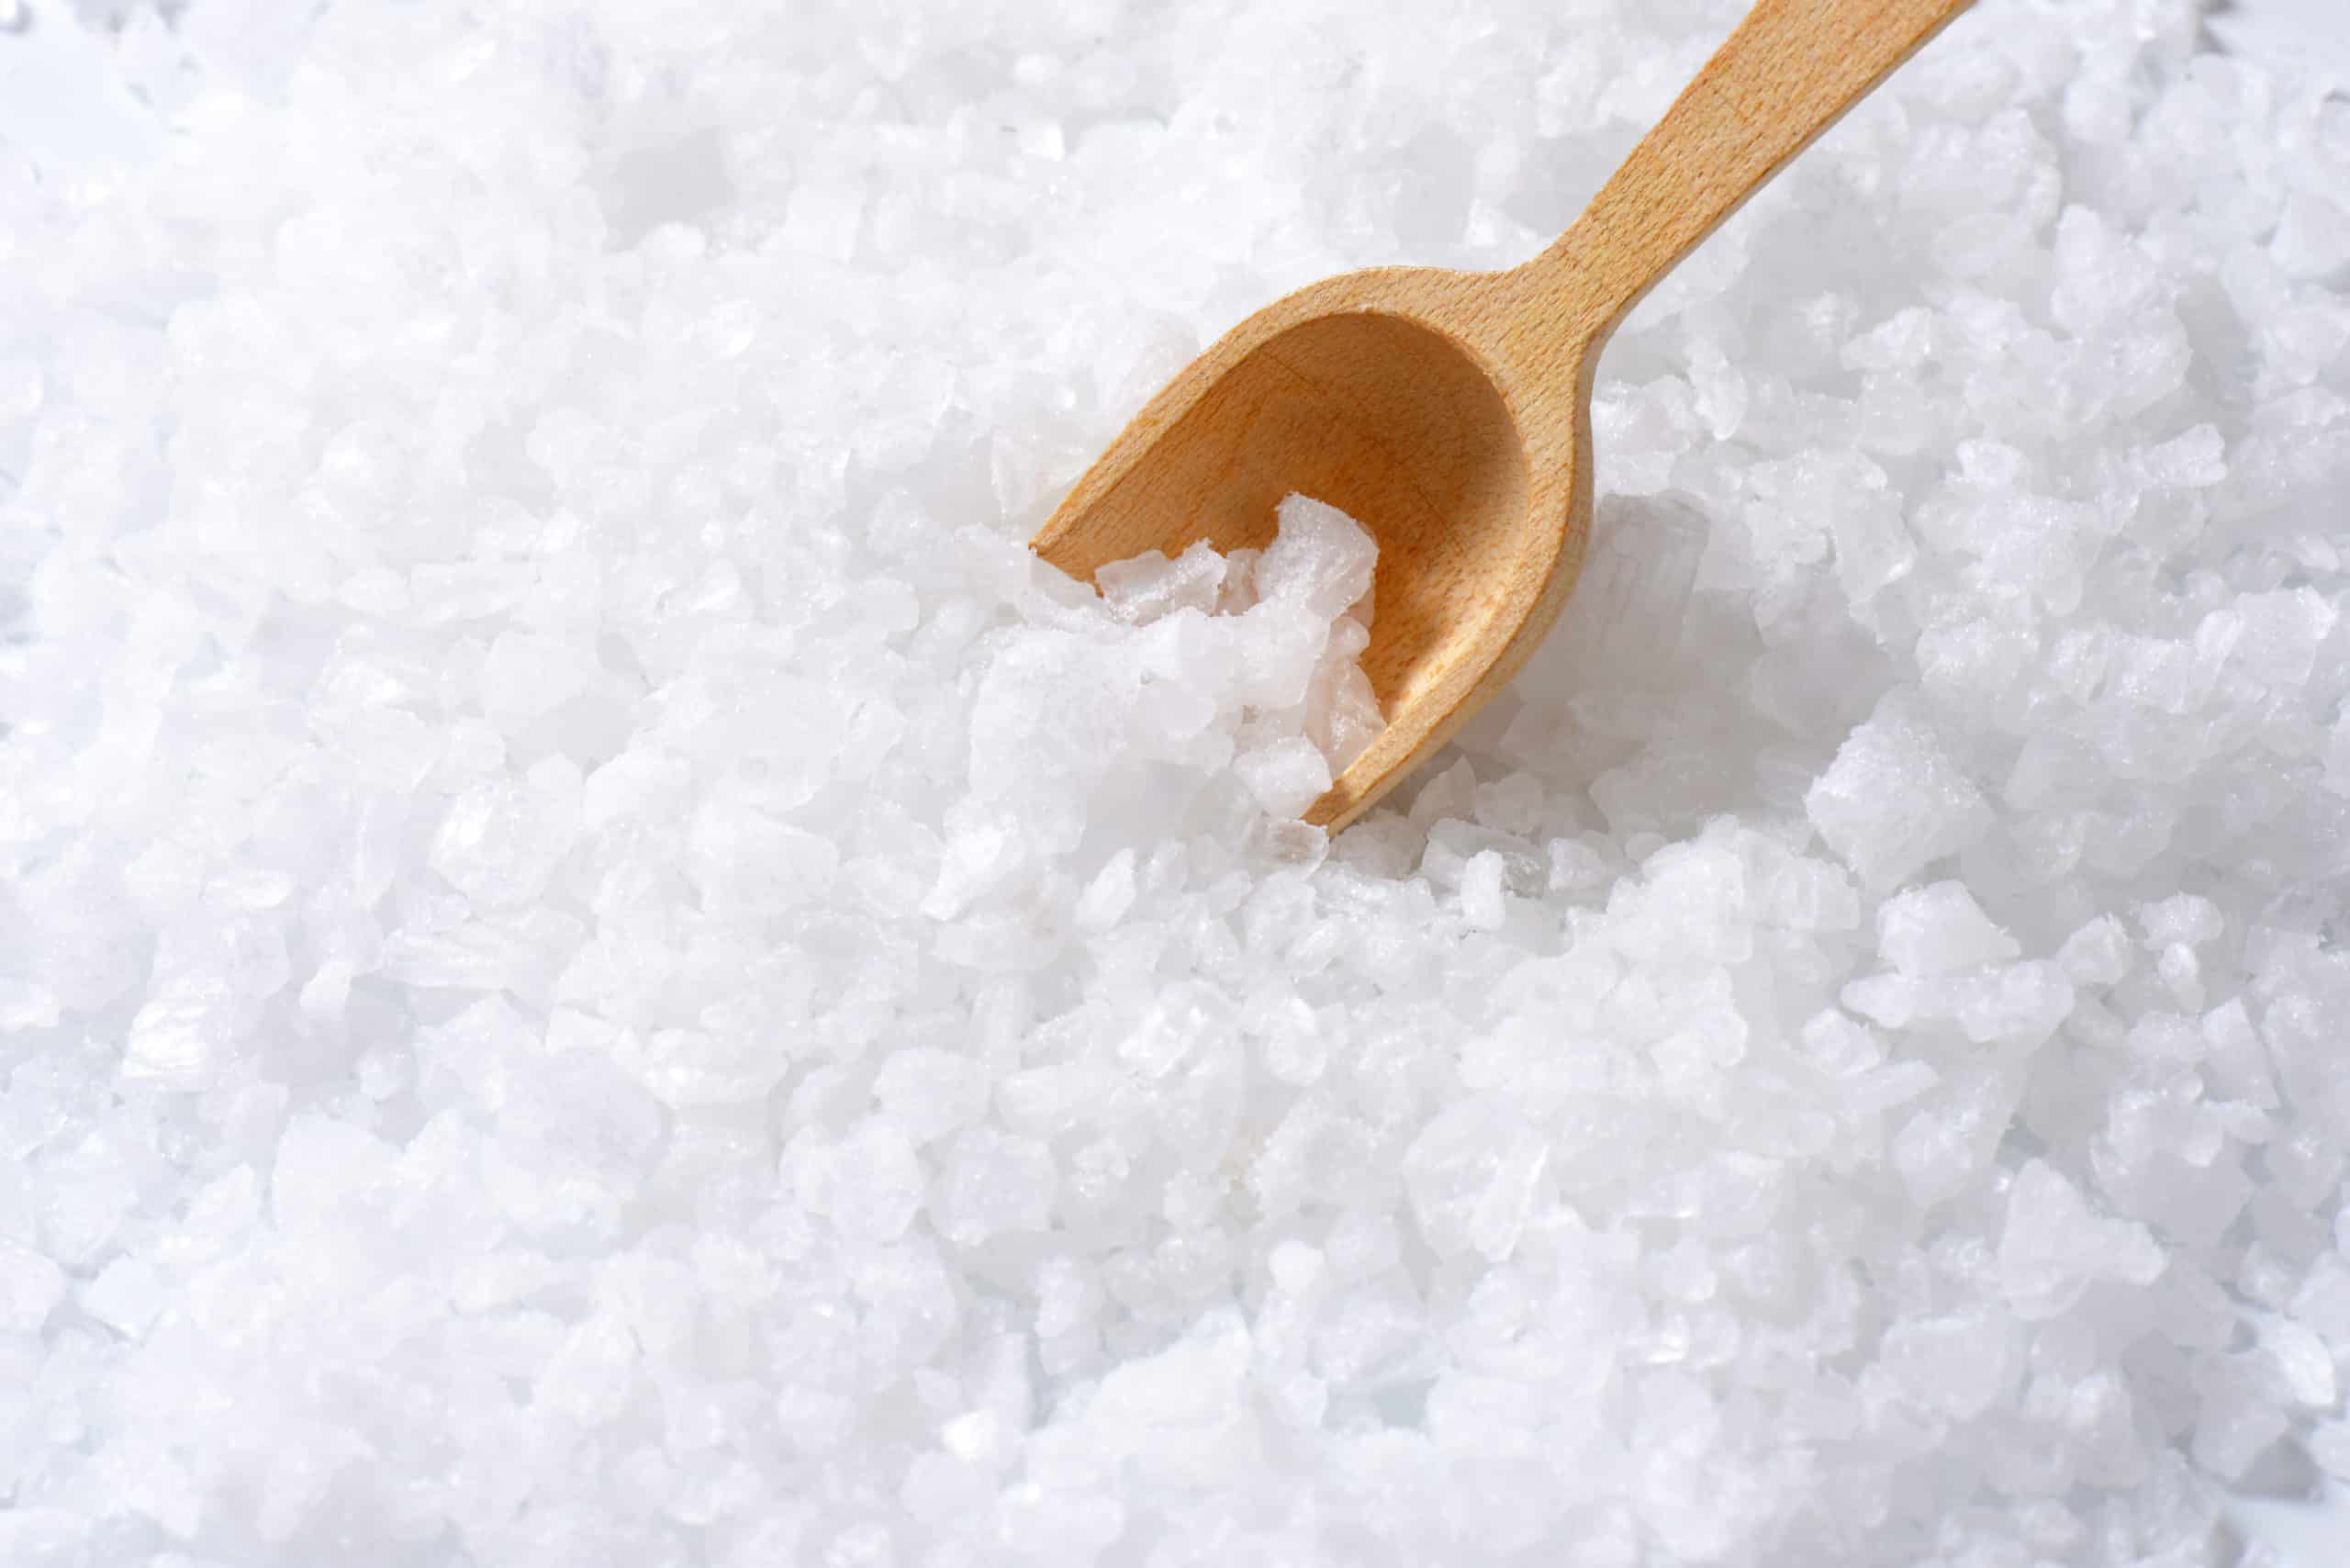 Salt from the Dead Sea, Dead Sea Salts, Where to Buy Dead Sea Salt, Dead Sea Salts Benefits, Dead Sea Salt Benefit